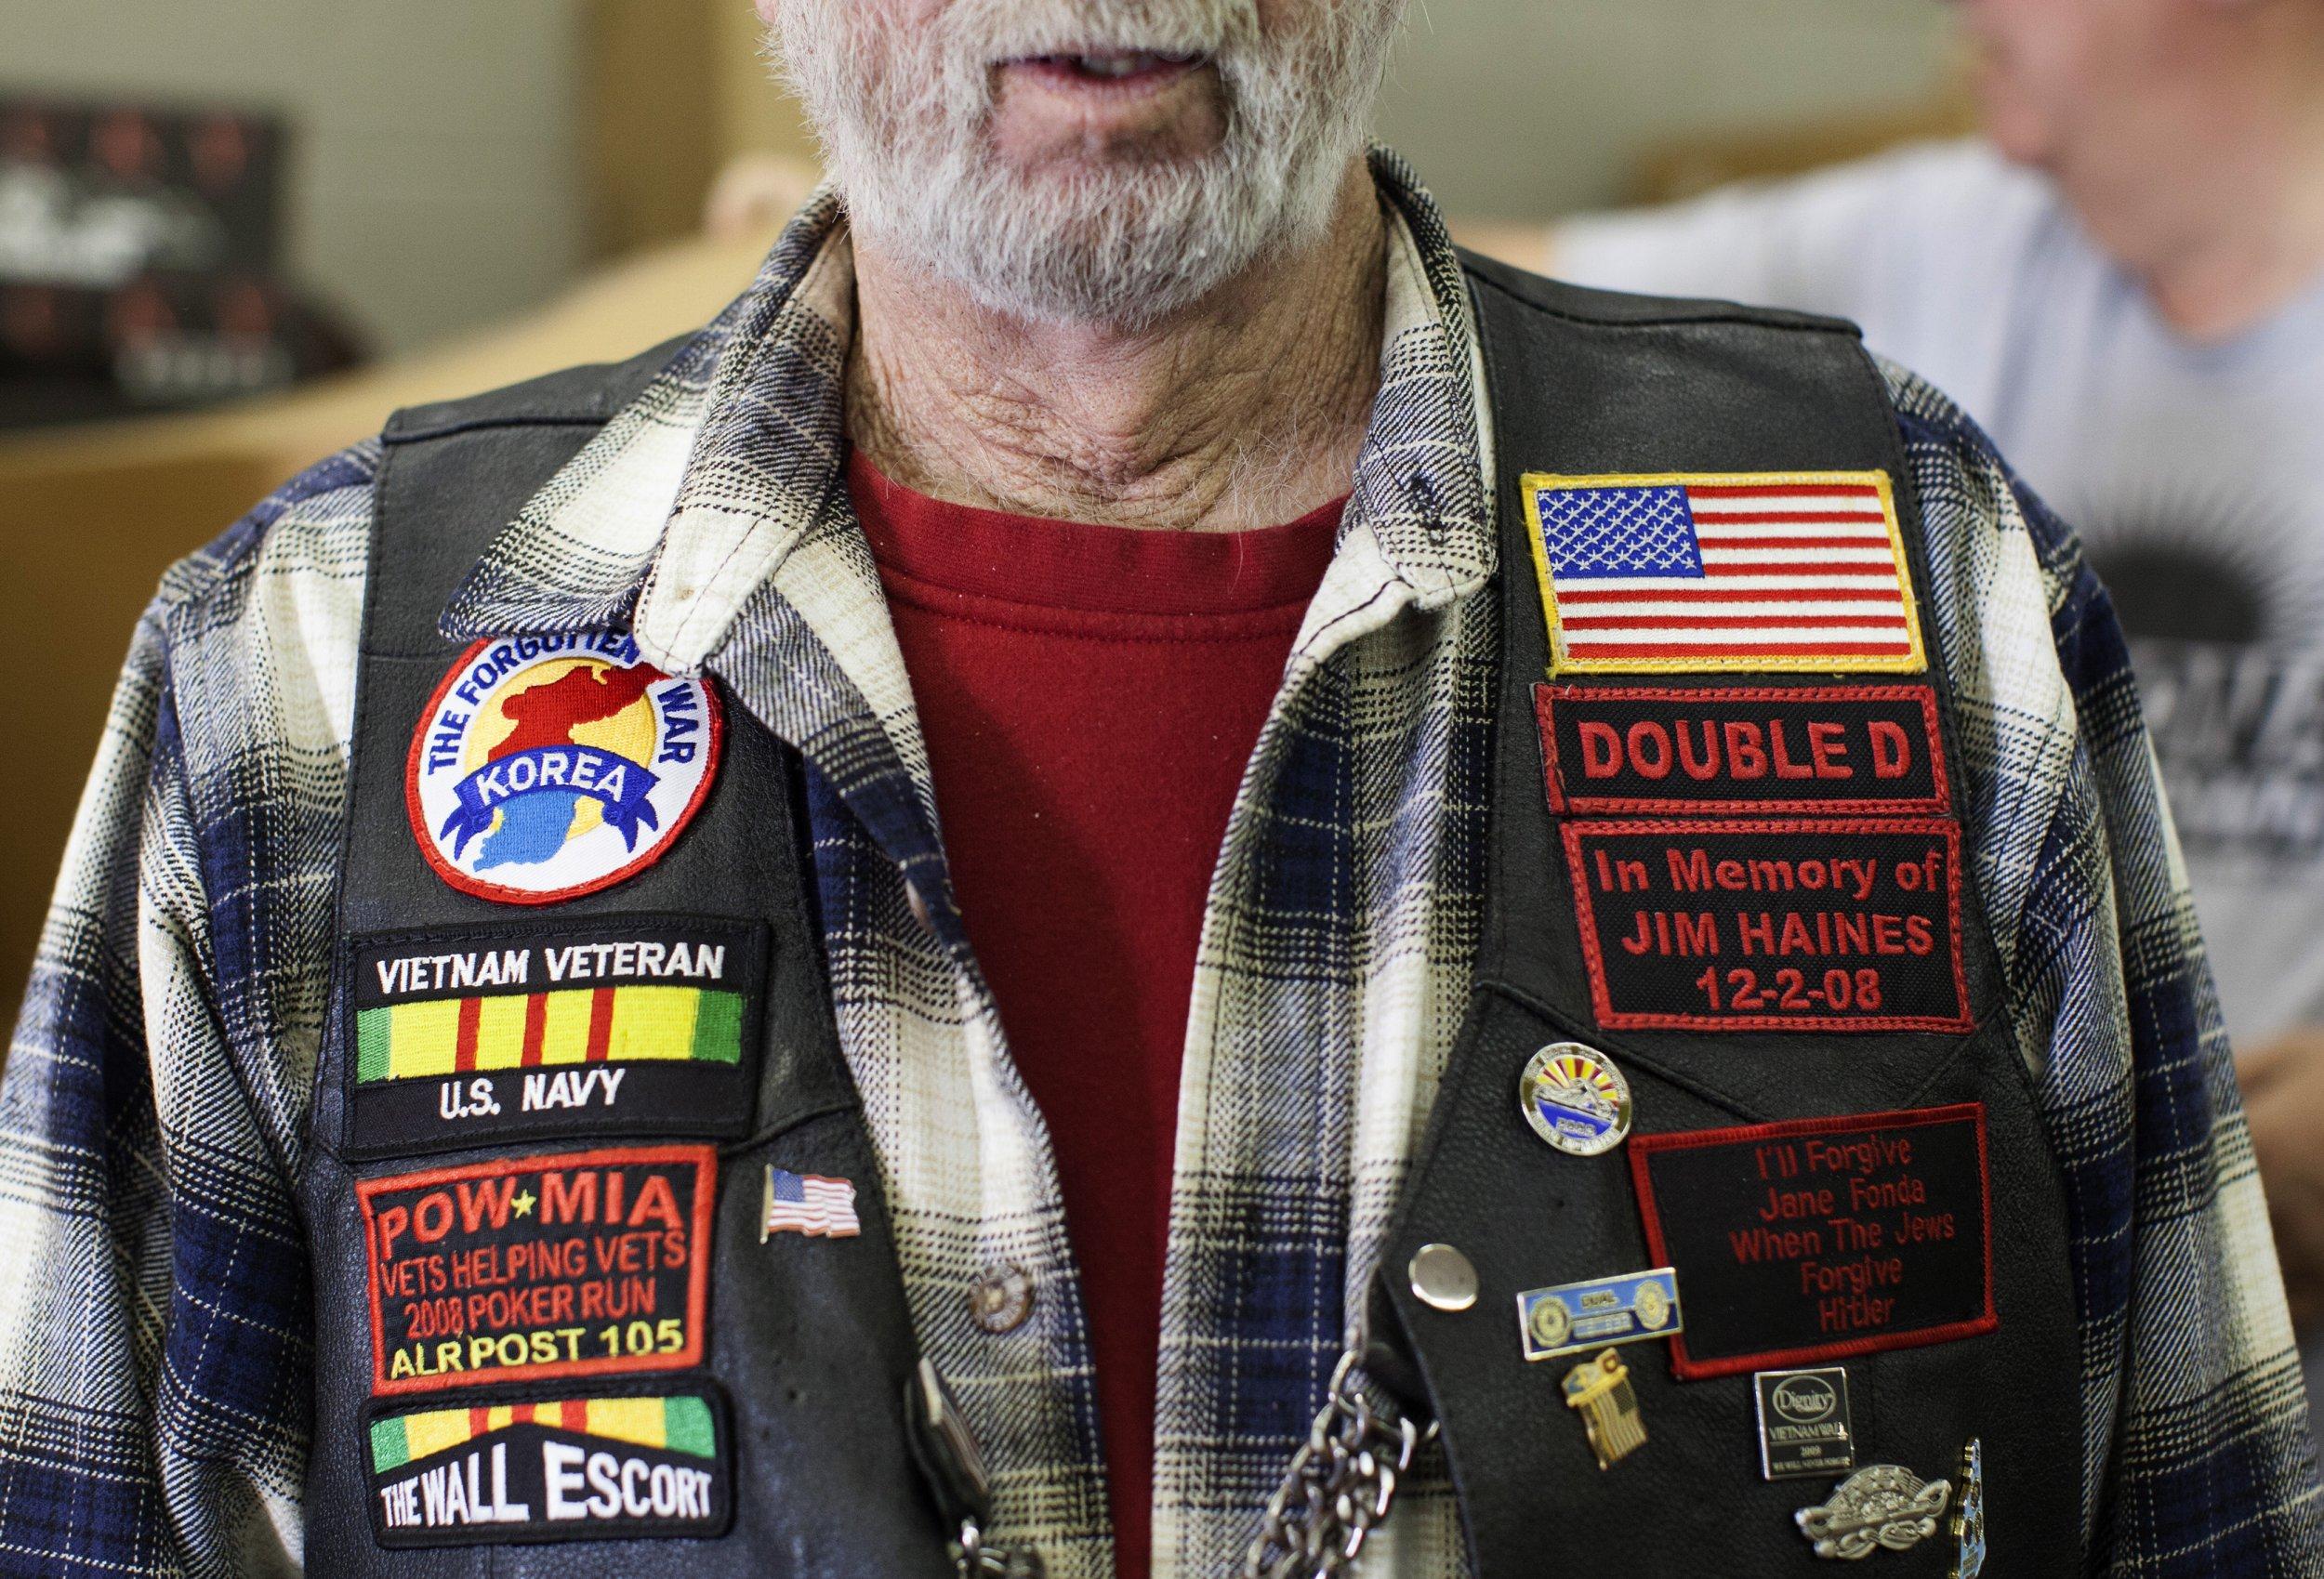 0316_Veterans_Second_Amendment_Protection_Act_01